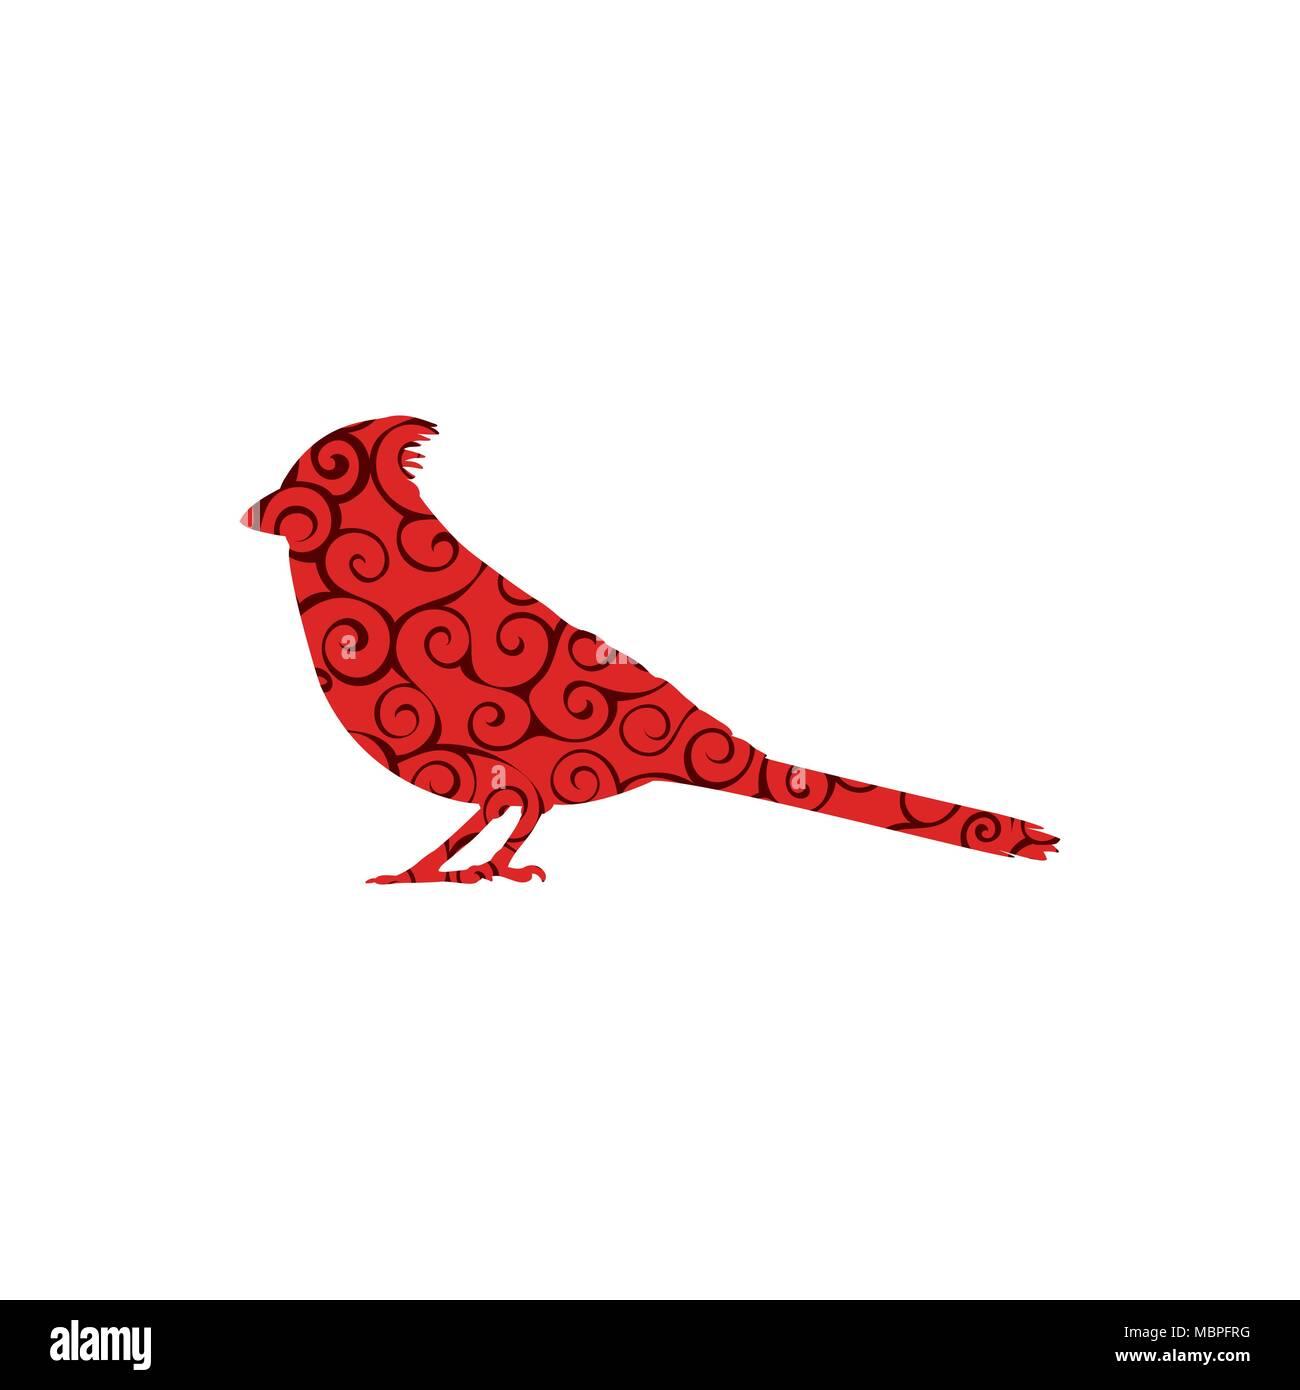 Nett Kardinal Vogel Färbung Seite Ideen - Framing Malvorlagen ...